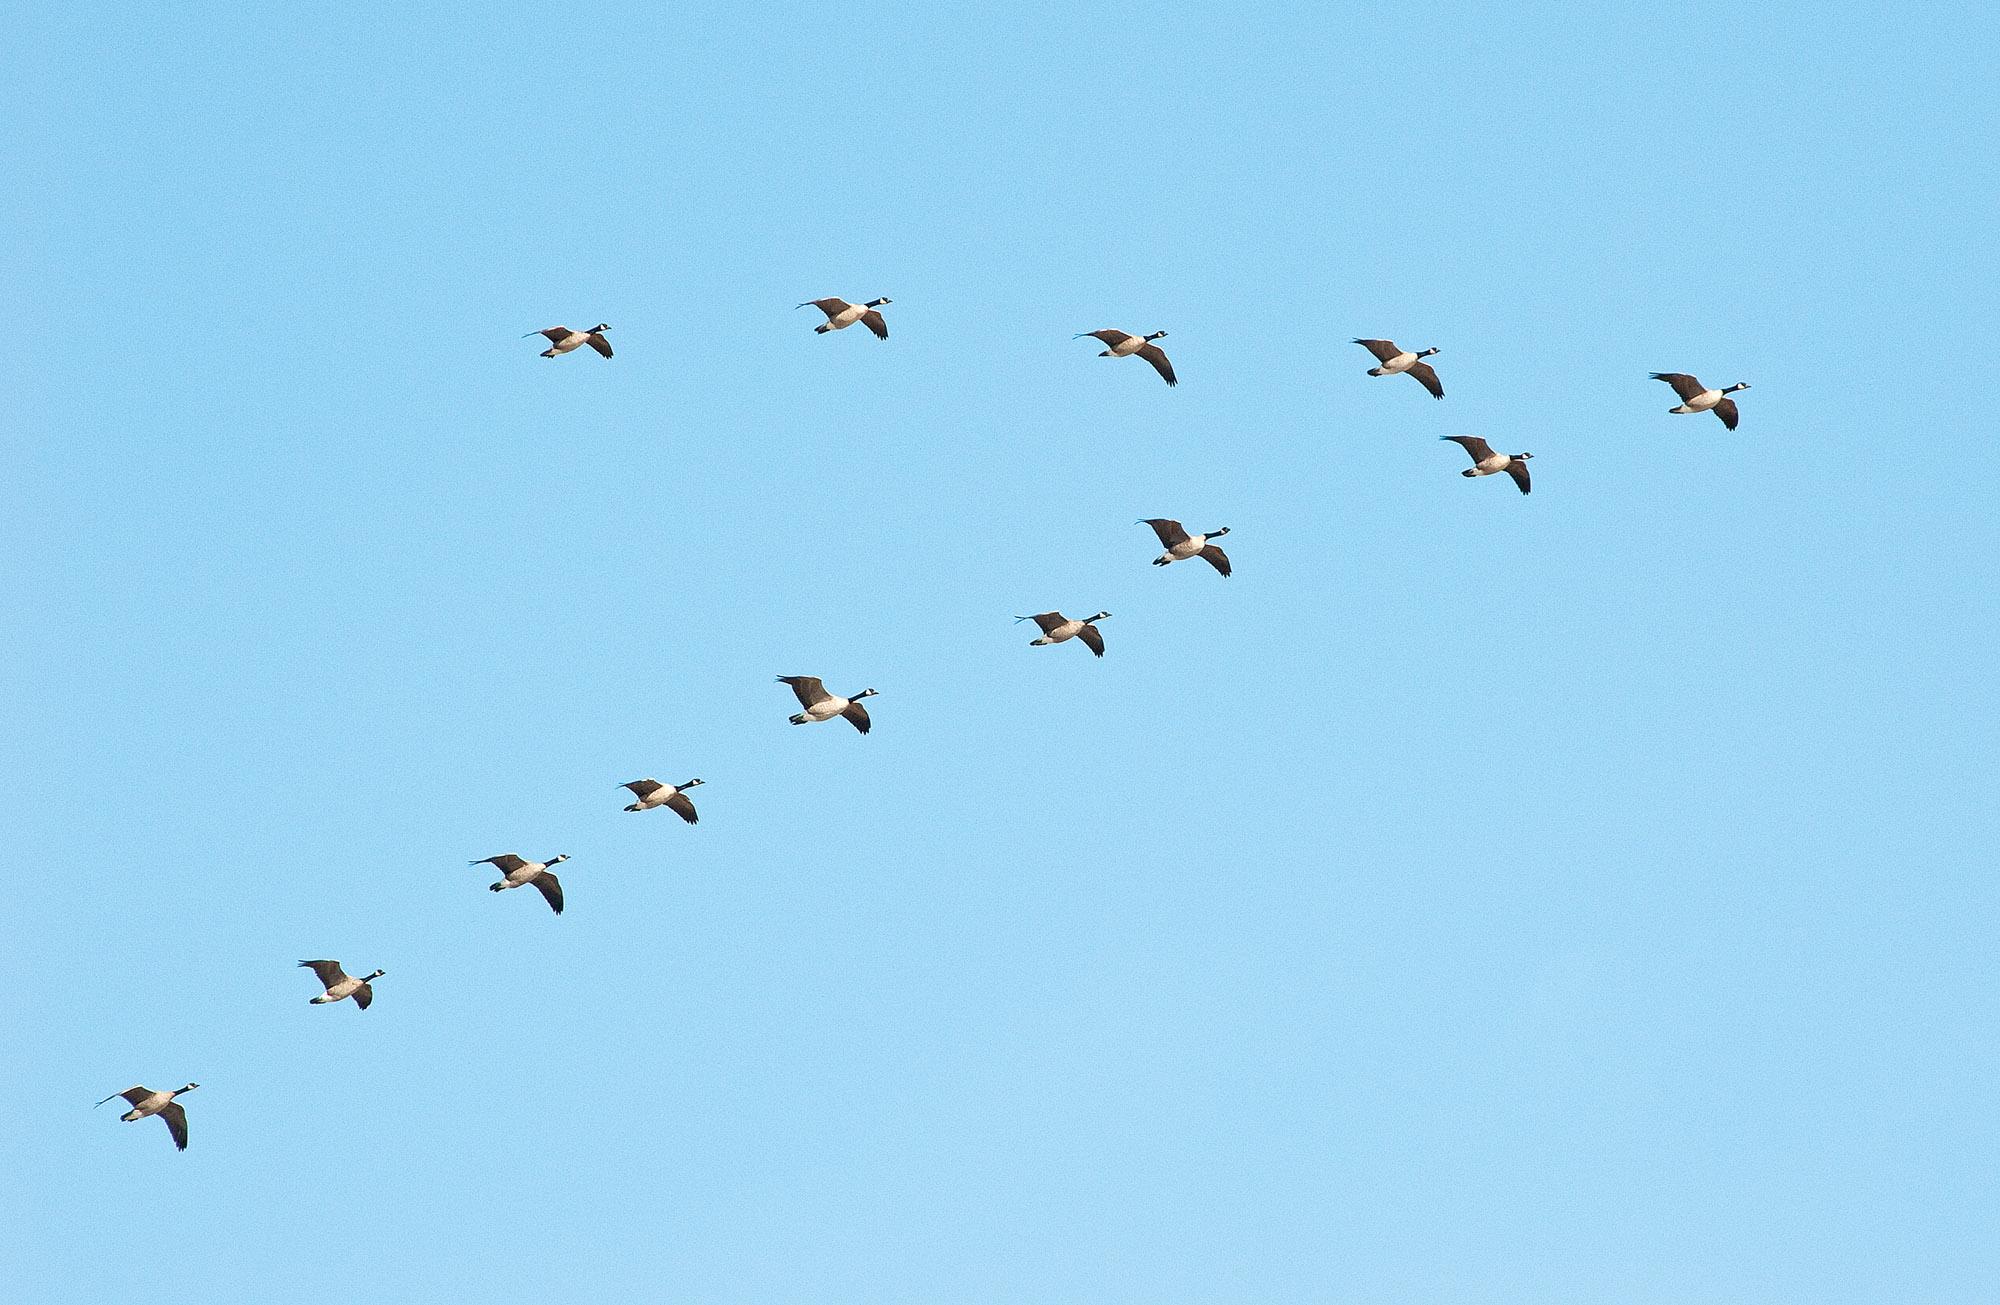 Bird Migration Formation Www Imgkid Com The Image Kid